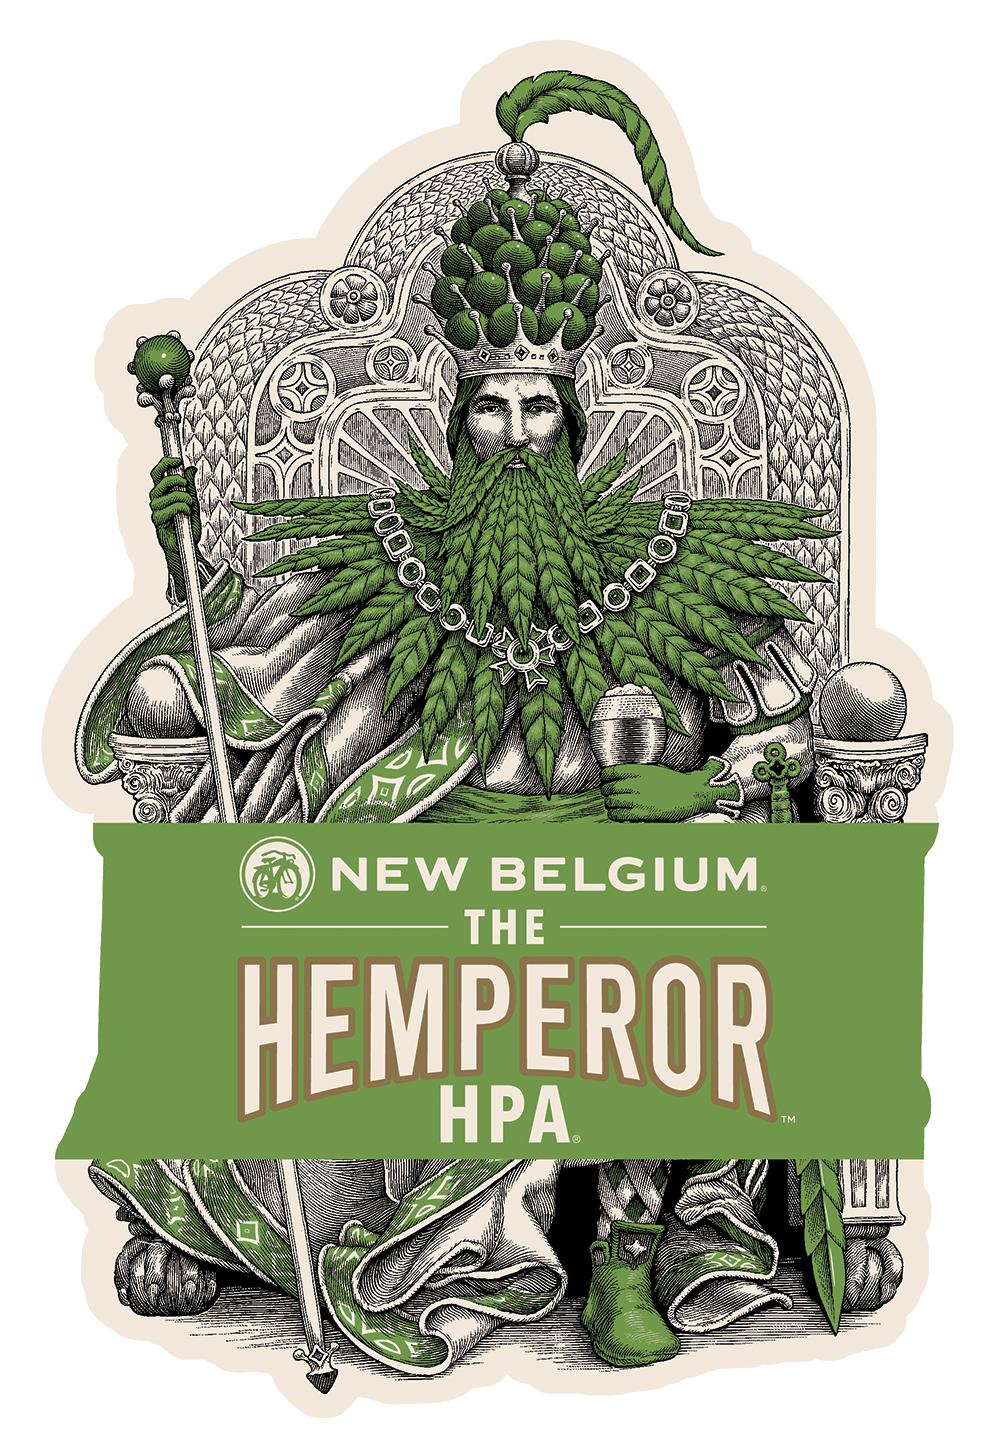 New Belgium announces The Hemperor HPA hemp beer. (photo provided by New Belgium Brewery)